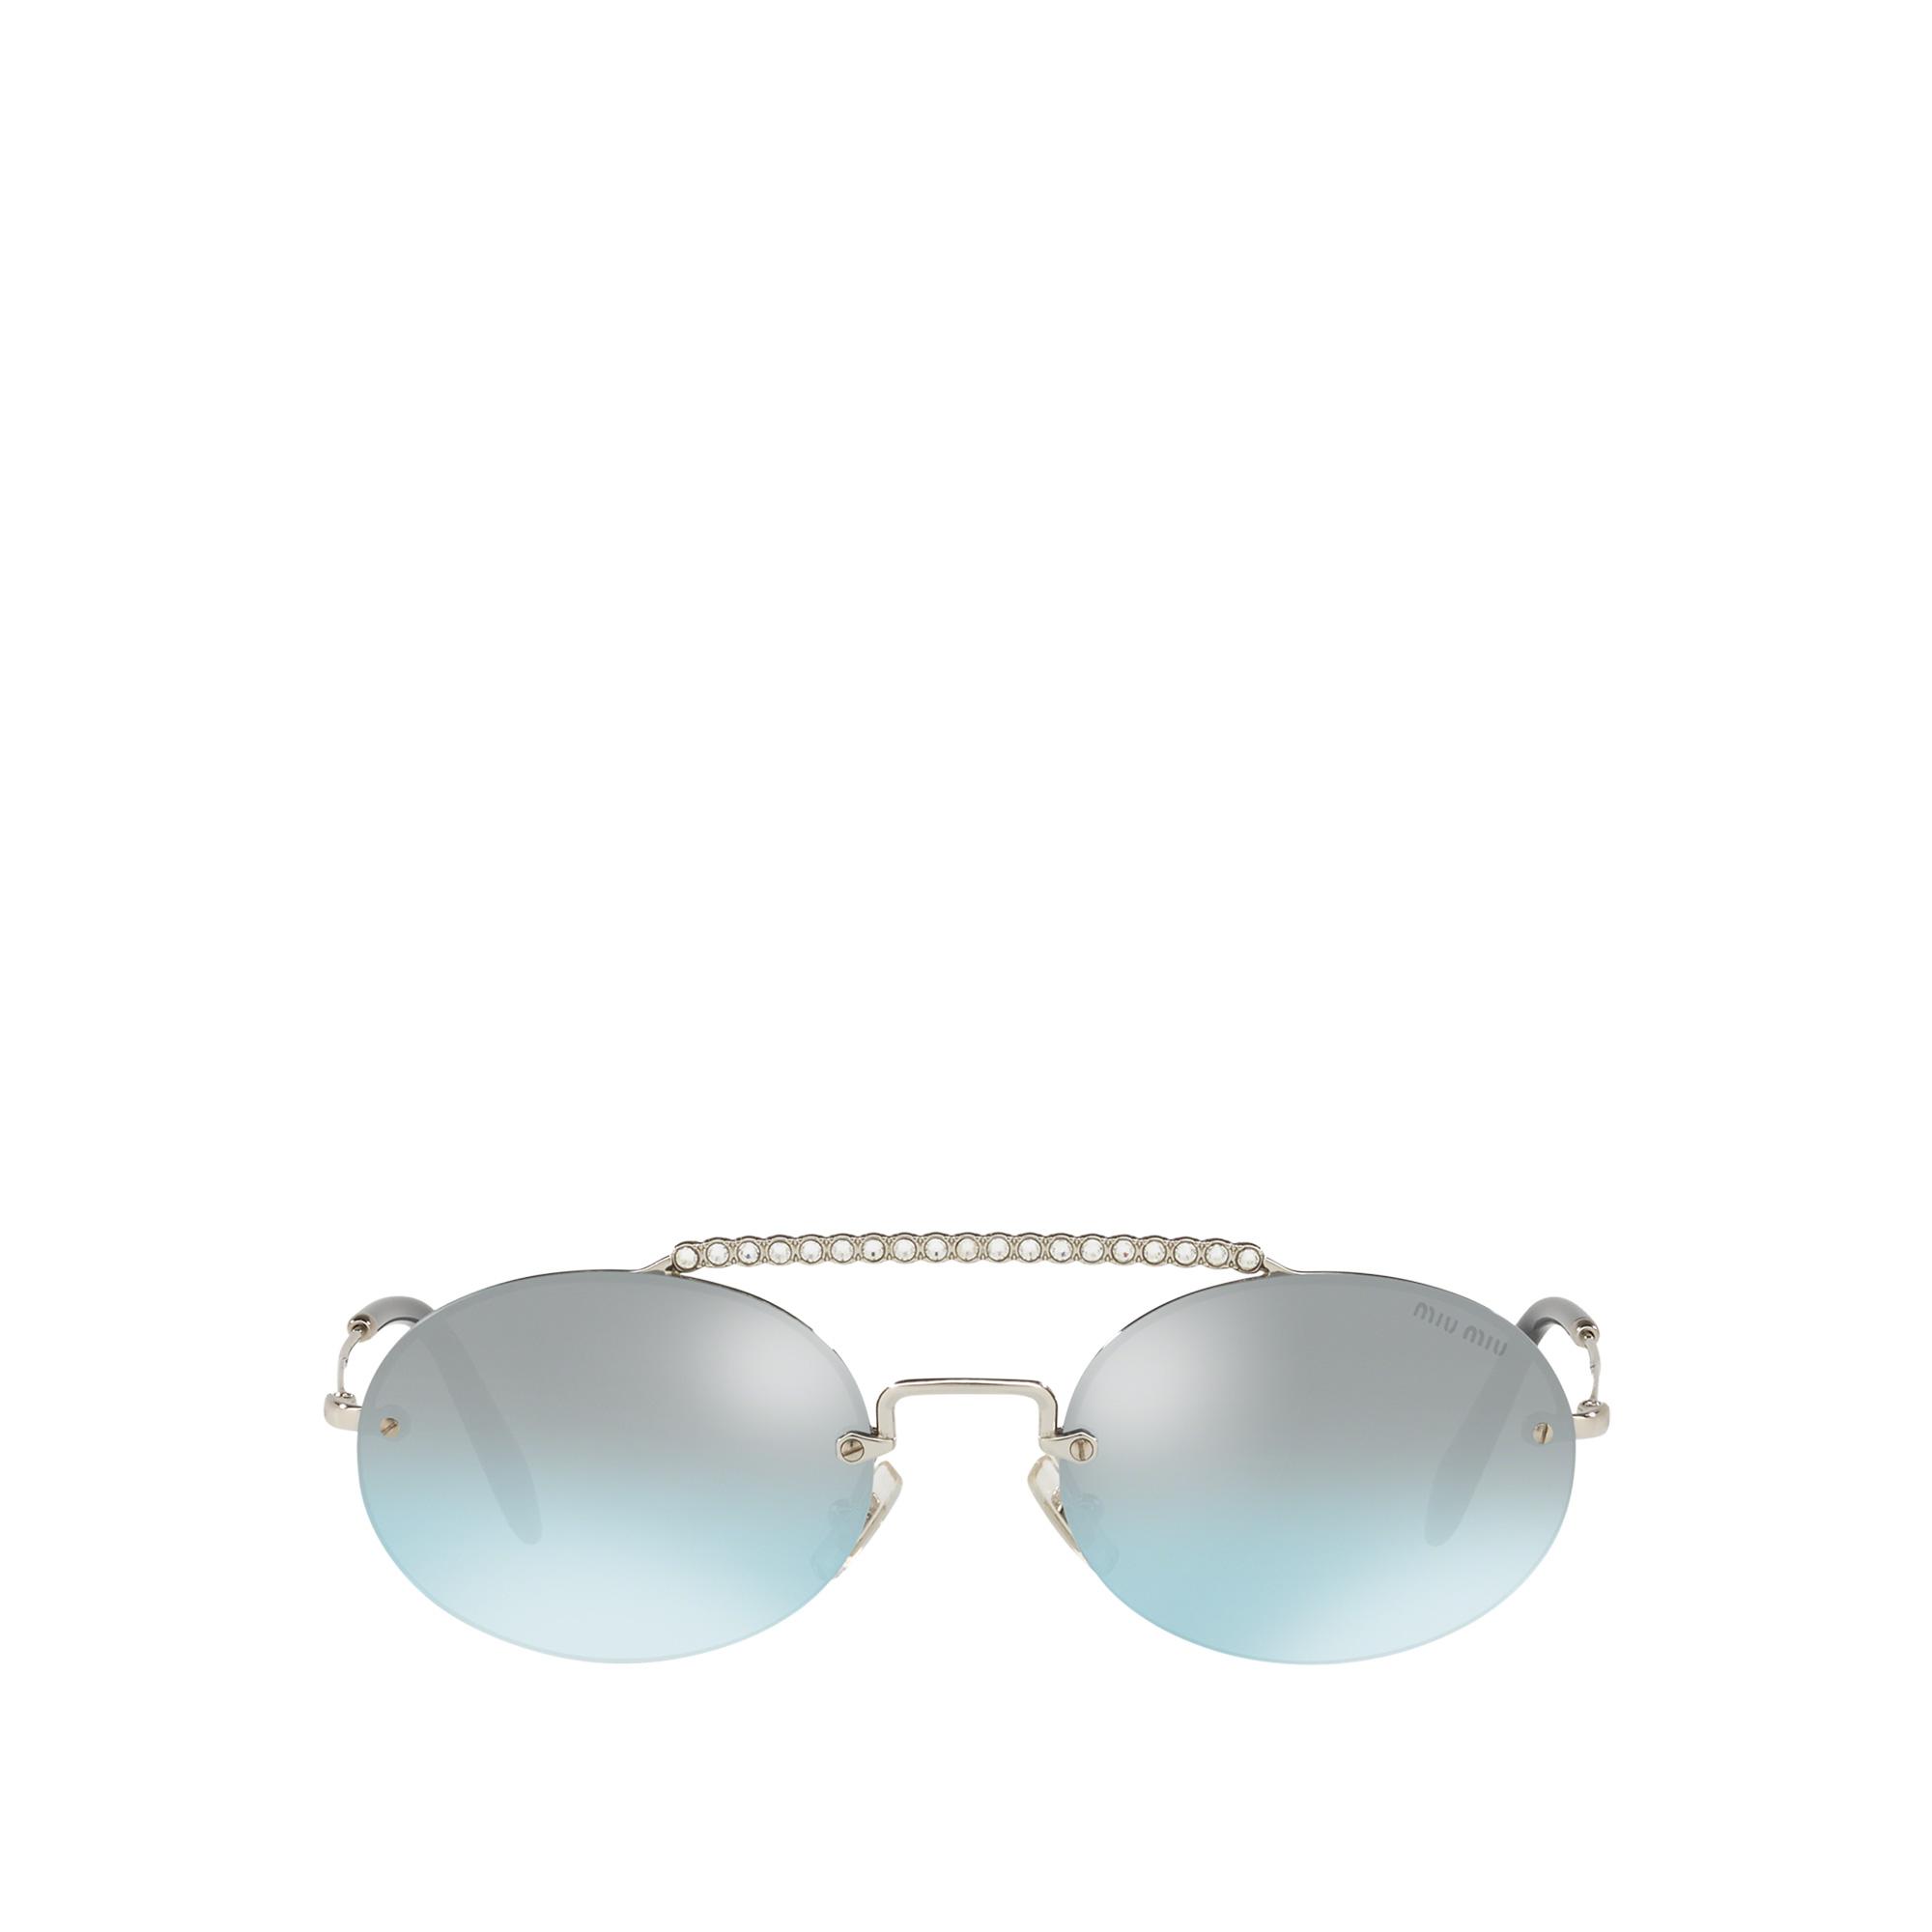 1f79b49f88fa3 Miu Miu Société Sunglasses with Crystals